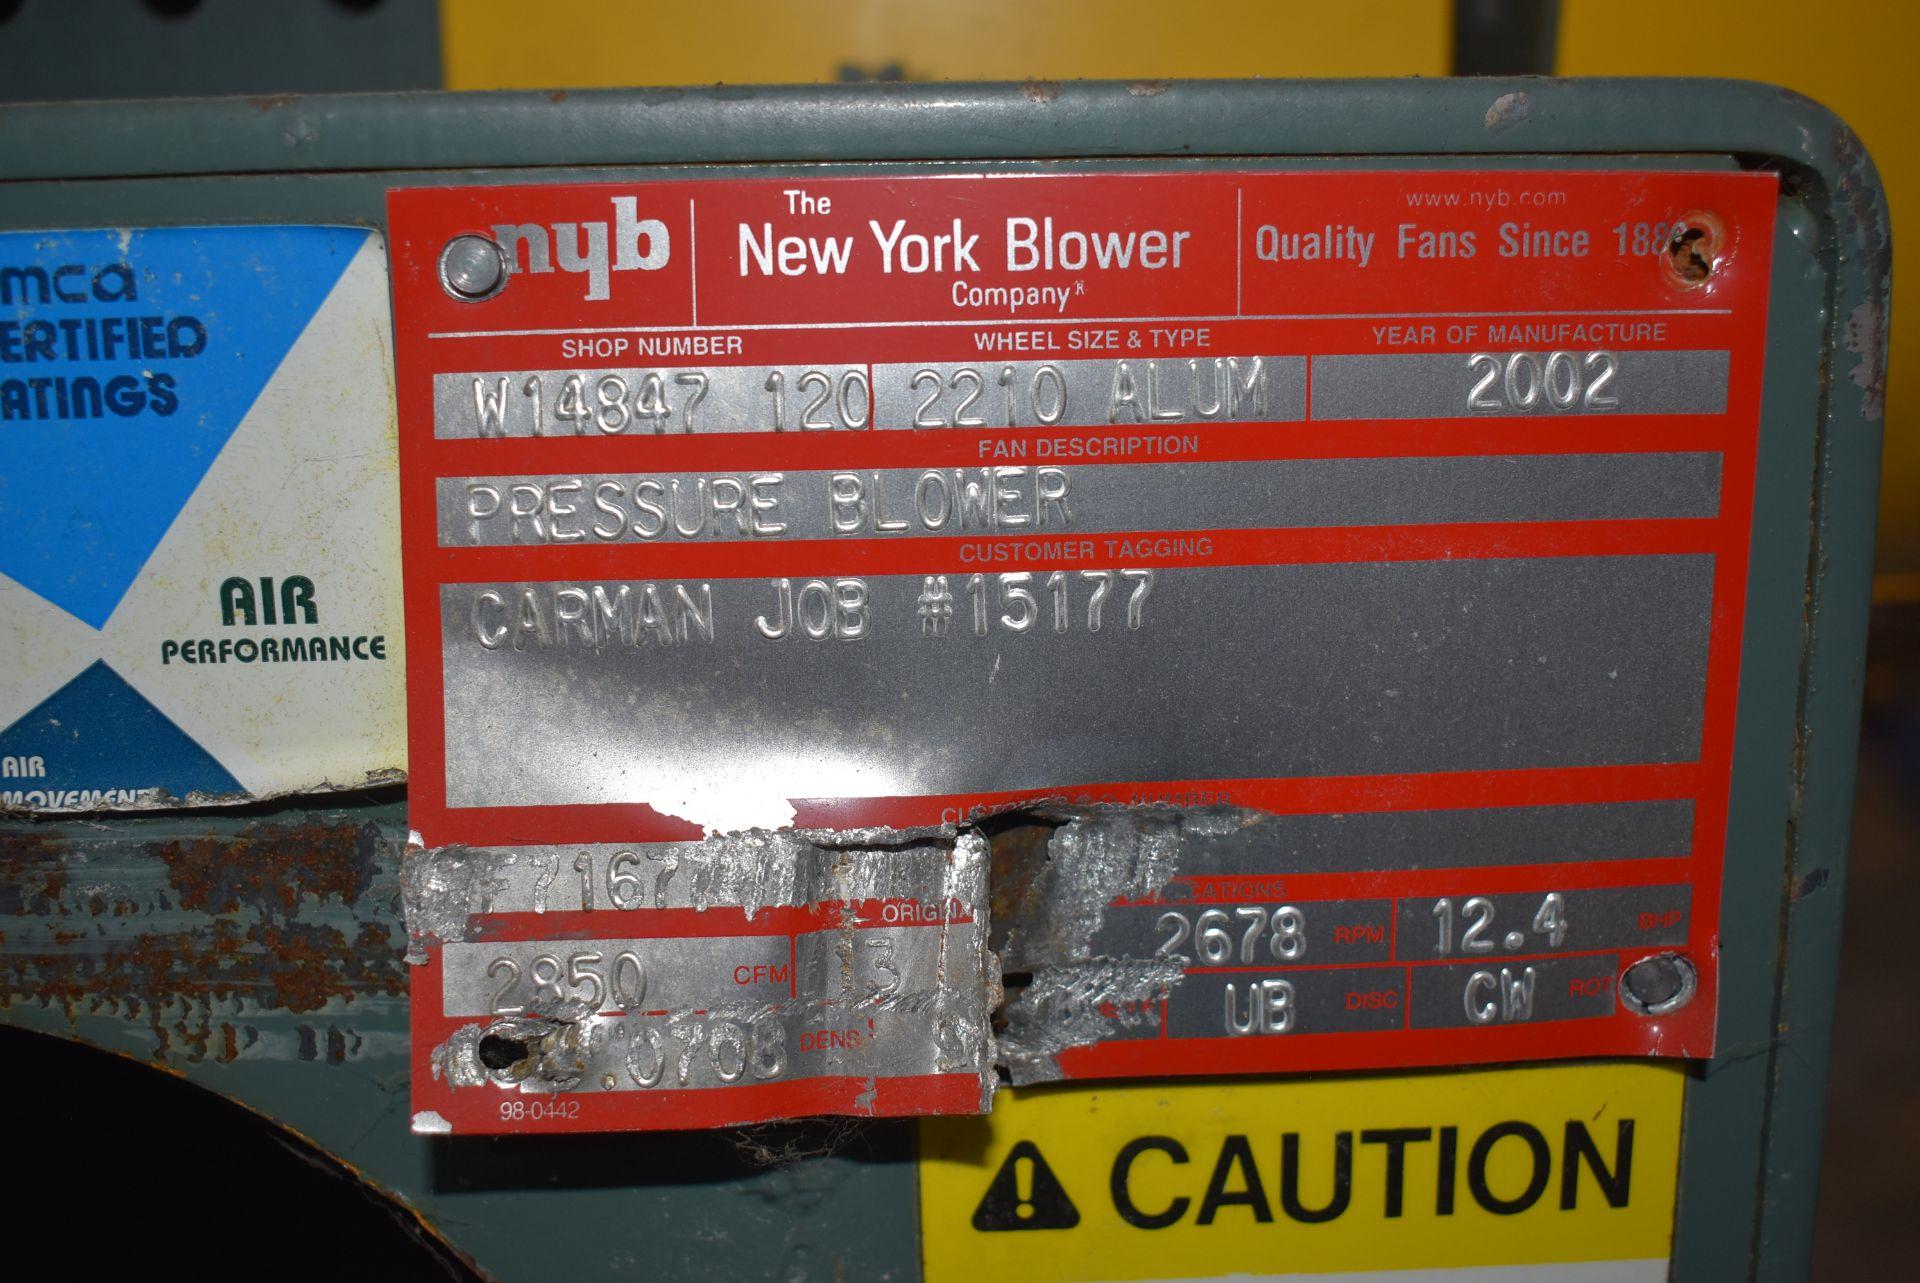 New York Blower, Wheel Size 2210 Aluminum w/15 HP Motor - Image 2 of 3